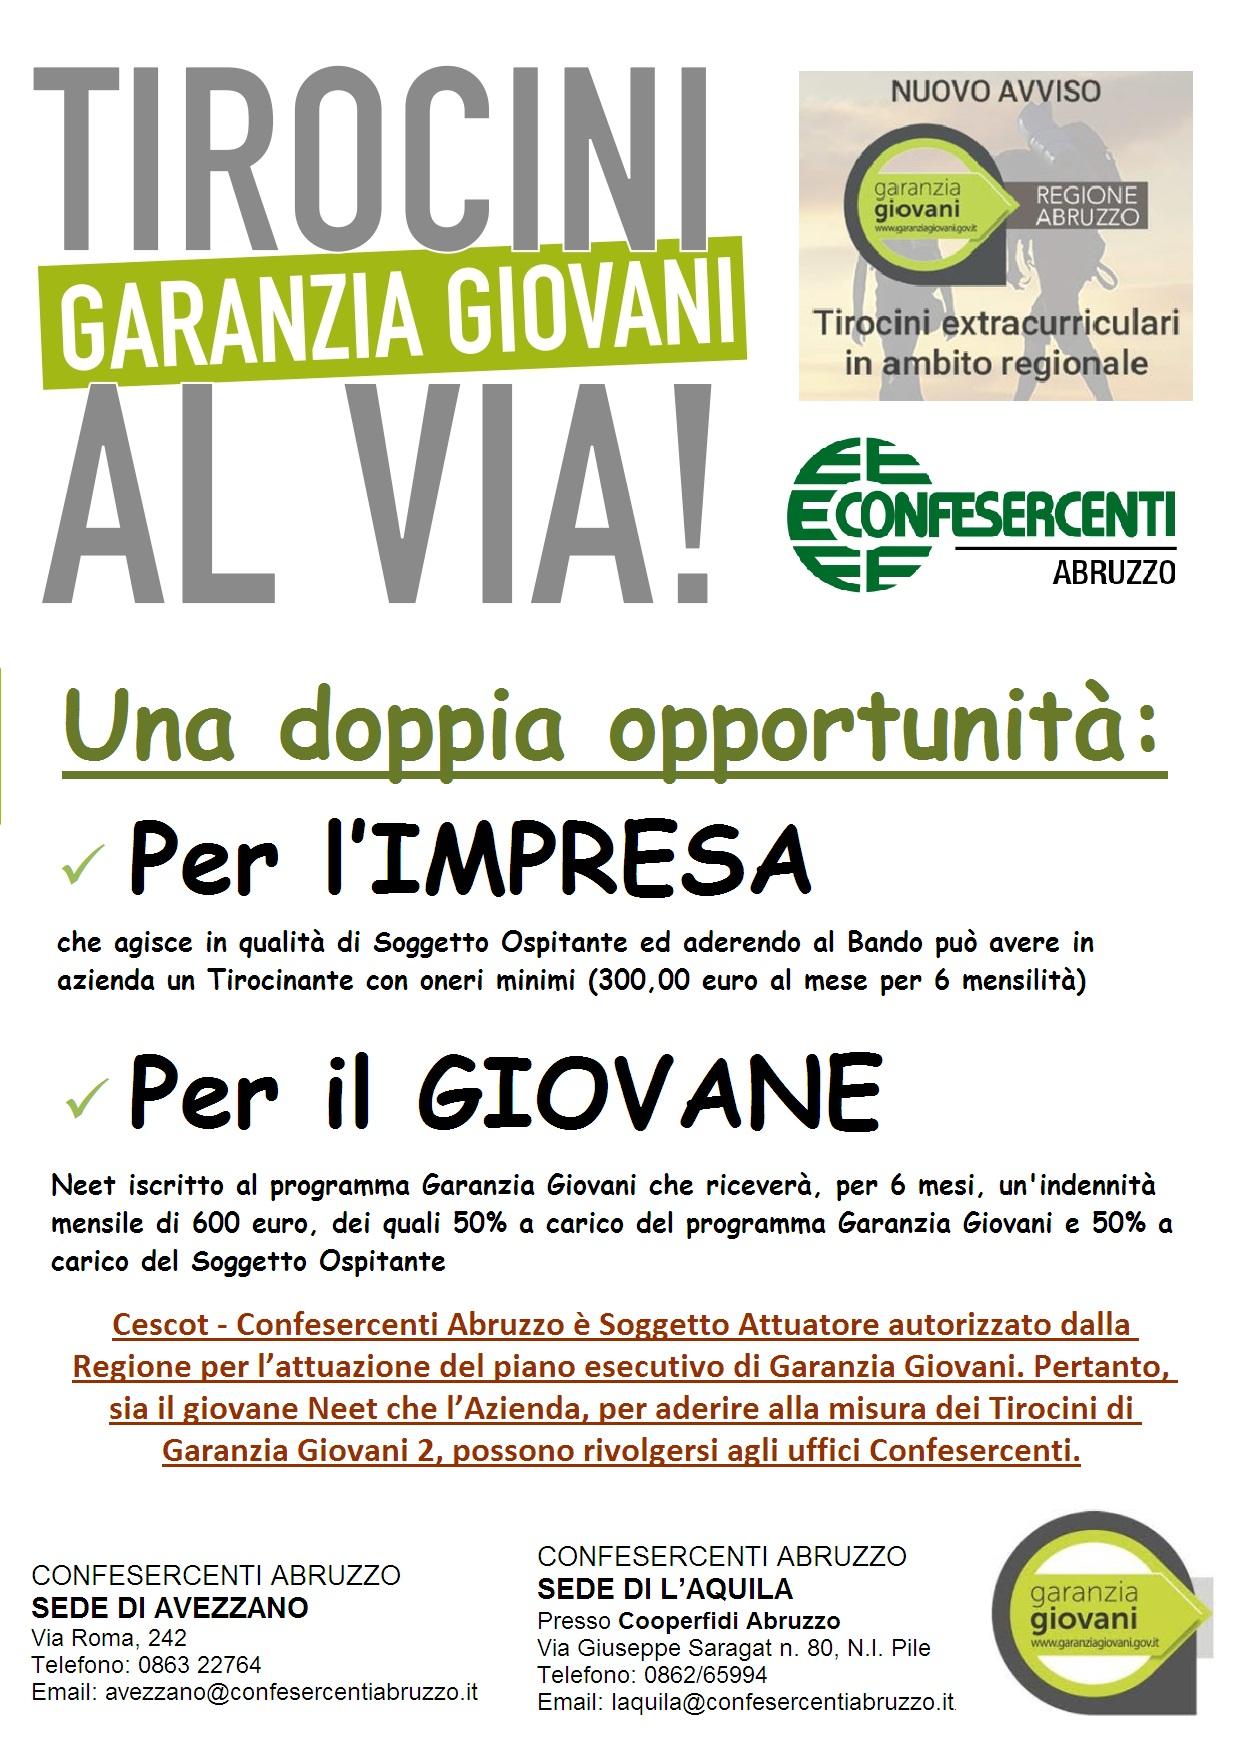 Locandina Garanzia Giovani Tirocini Sett.2019